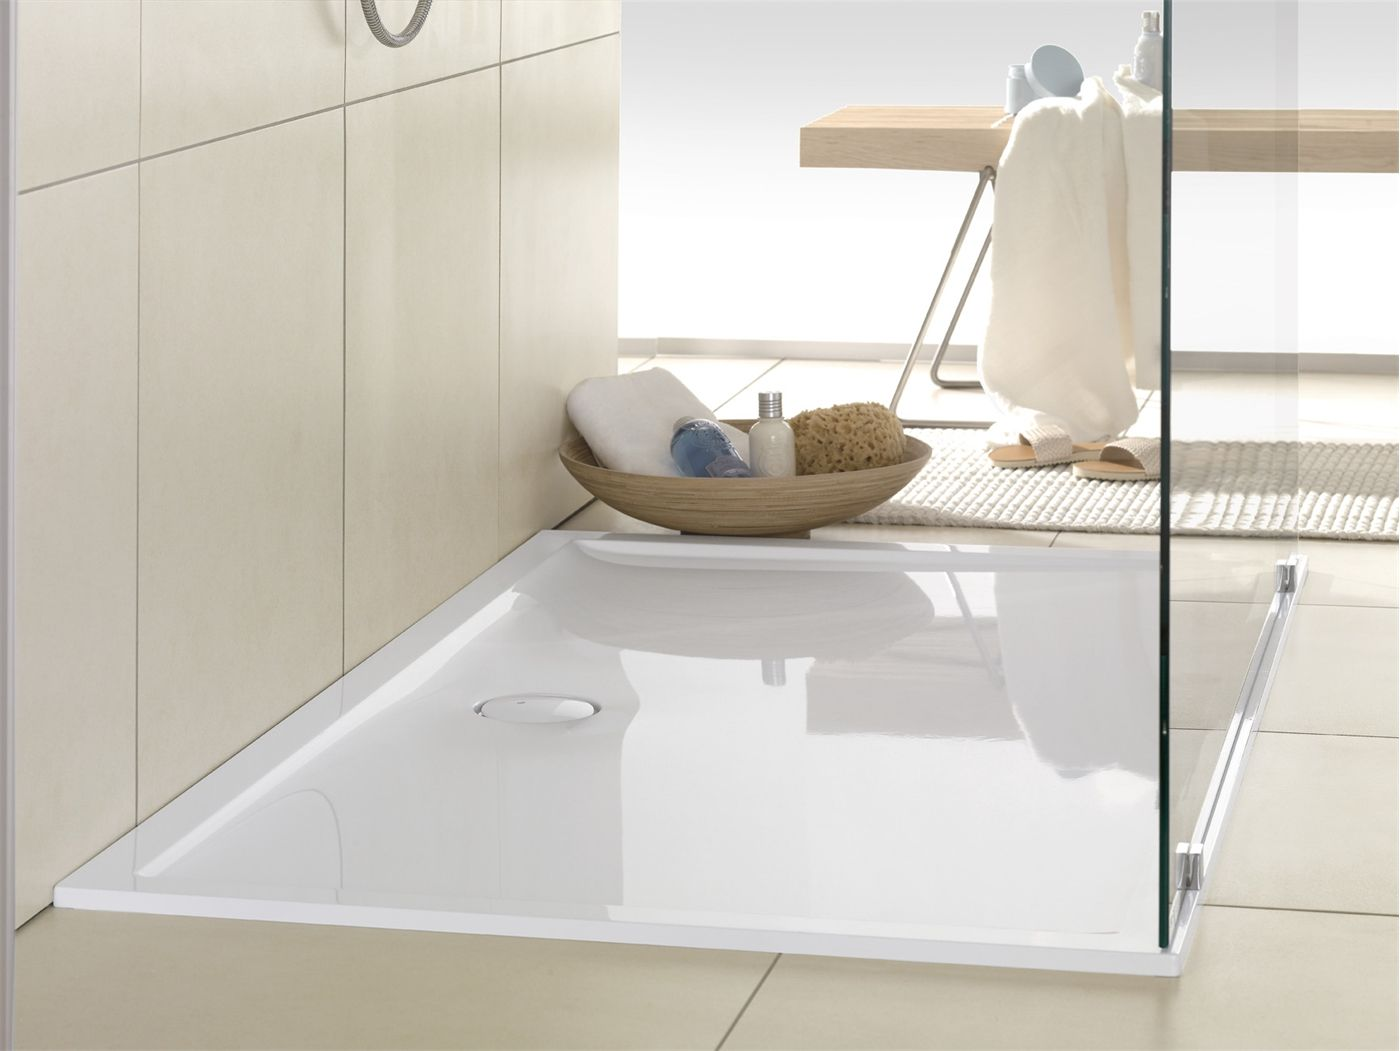 V B Futurion Flat Dusjkar 1000x800 Mm Produsert I Quaryl Dusjkar Bad Layout Produkter